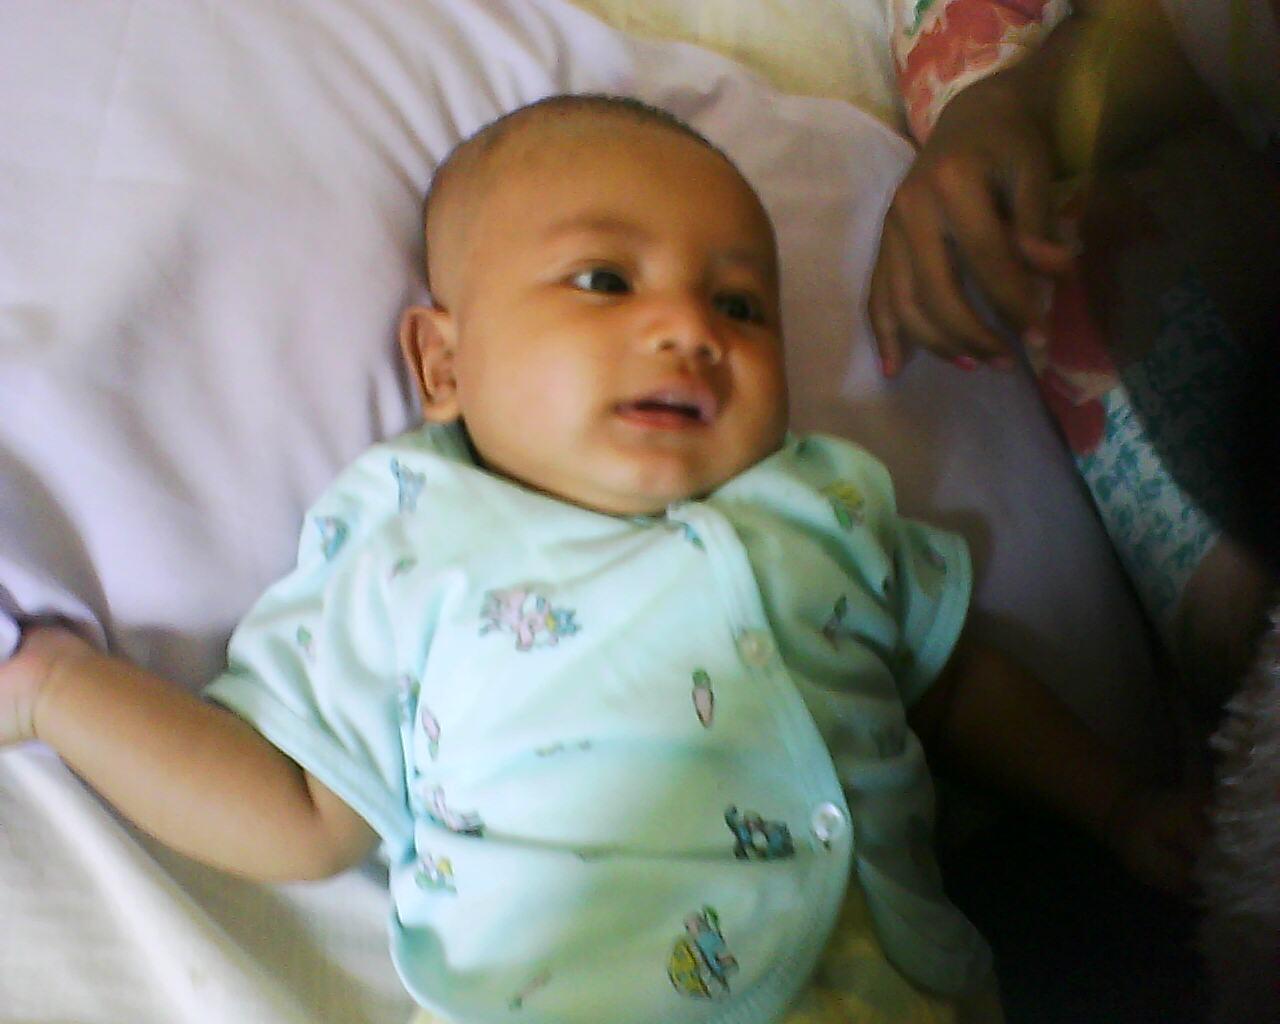 Gambar Bayi Asfiksia